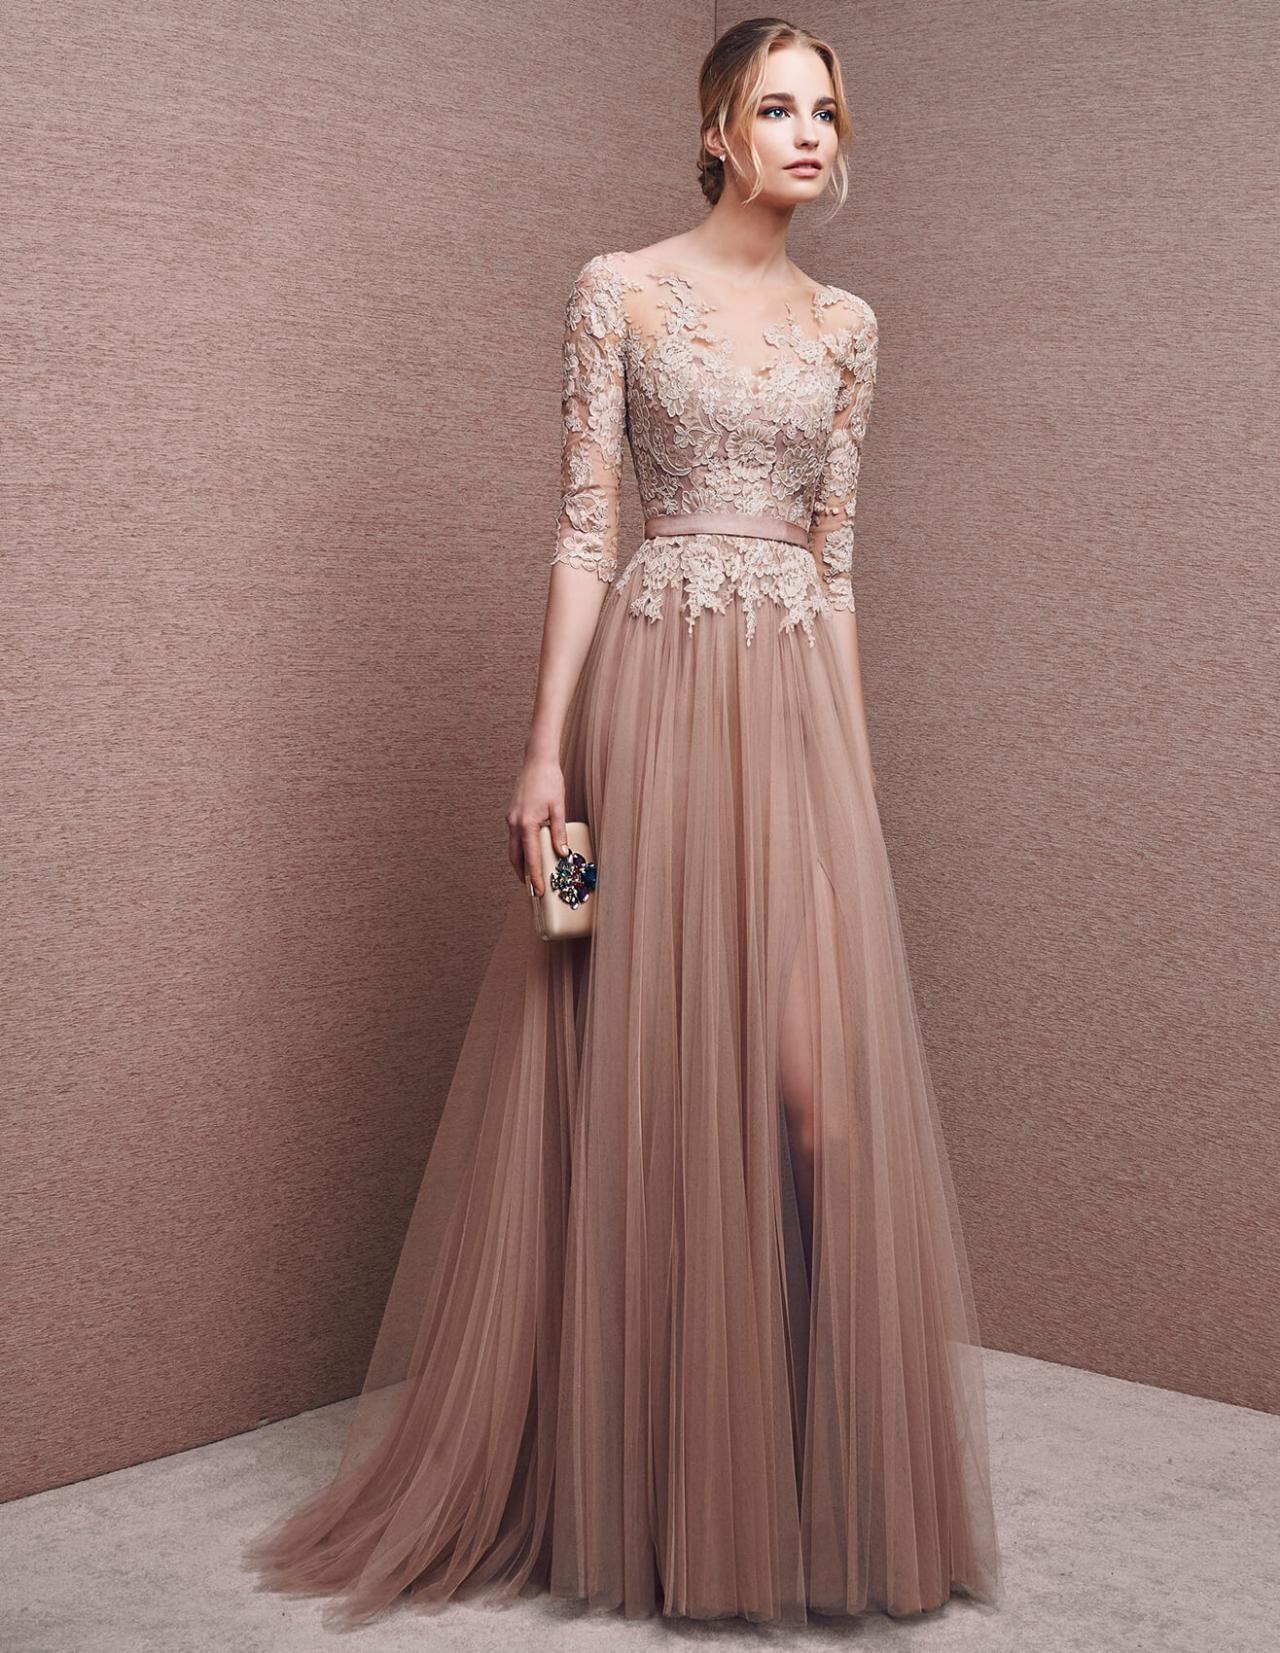 Womenus sleeves lace top chiffon formal evening dresses long